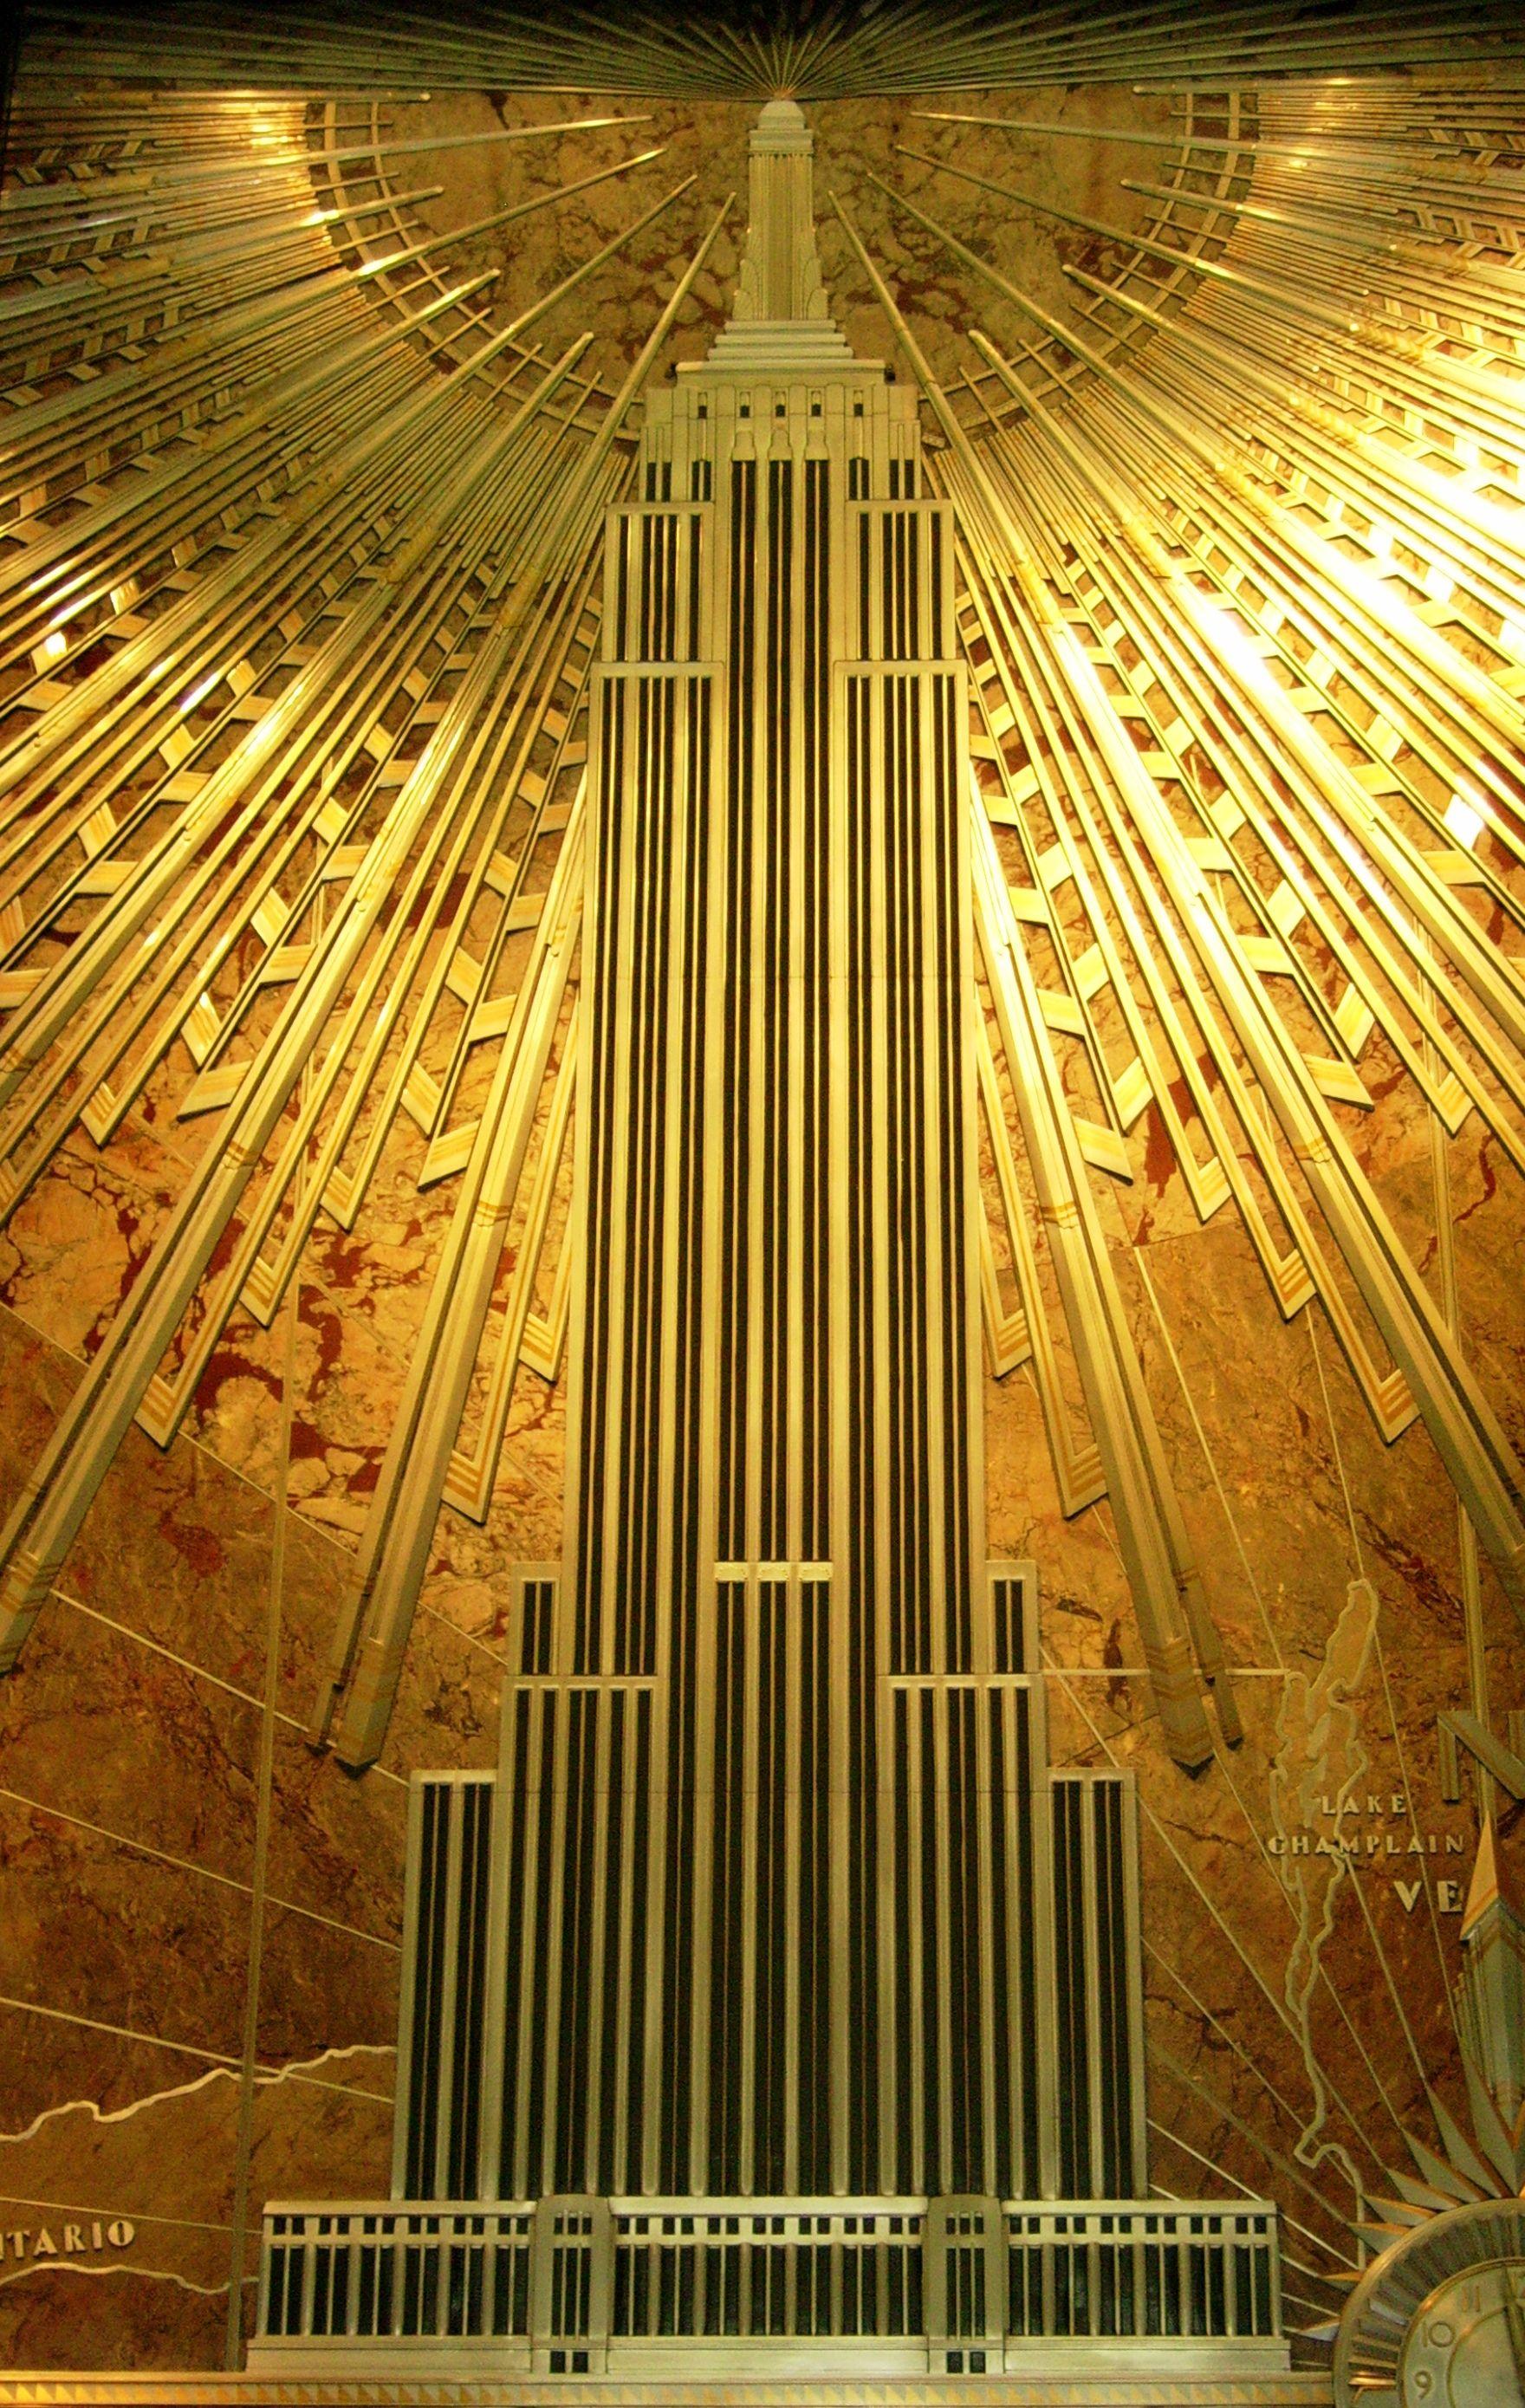 Art Deco Plaque Depicting Empire State Building Empire